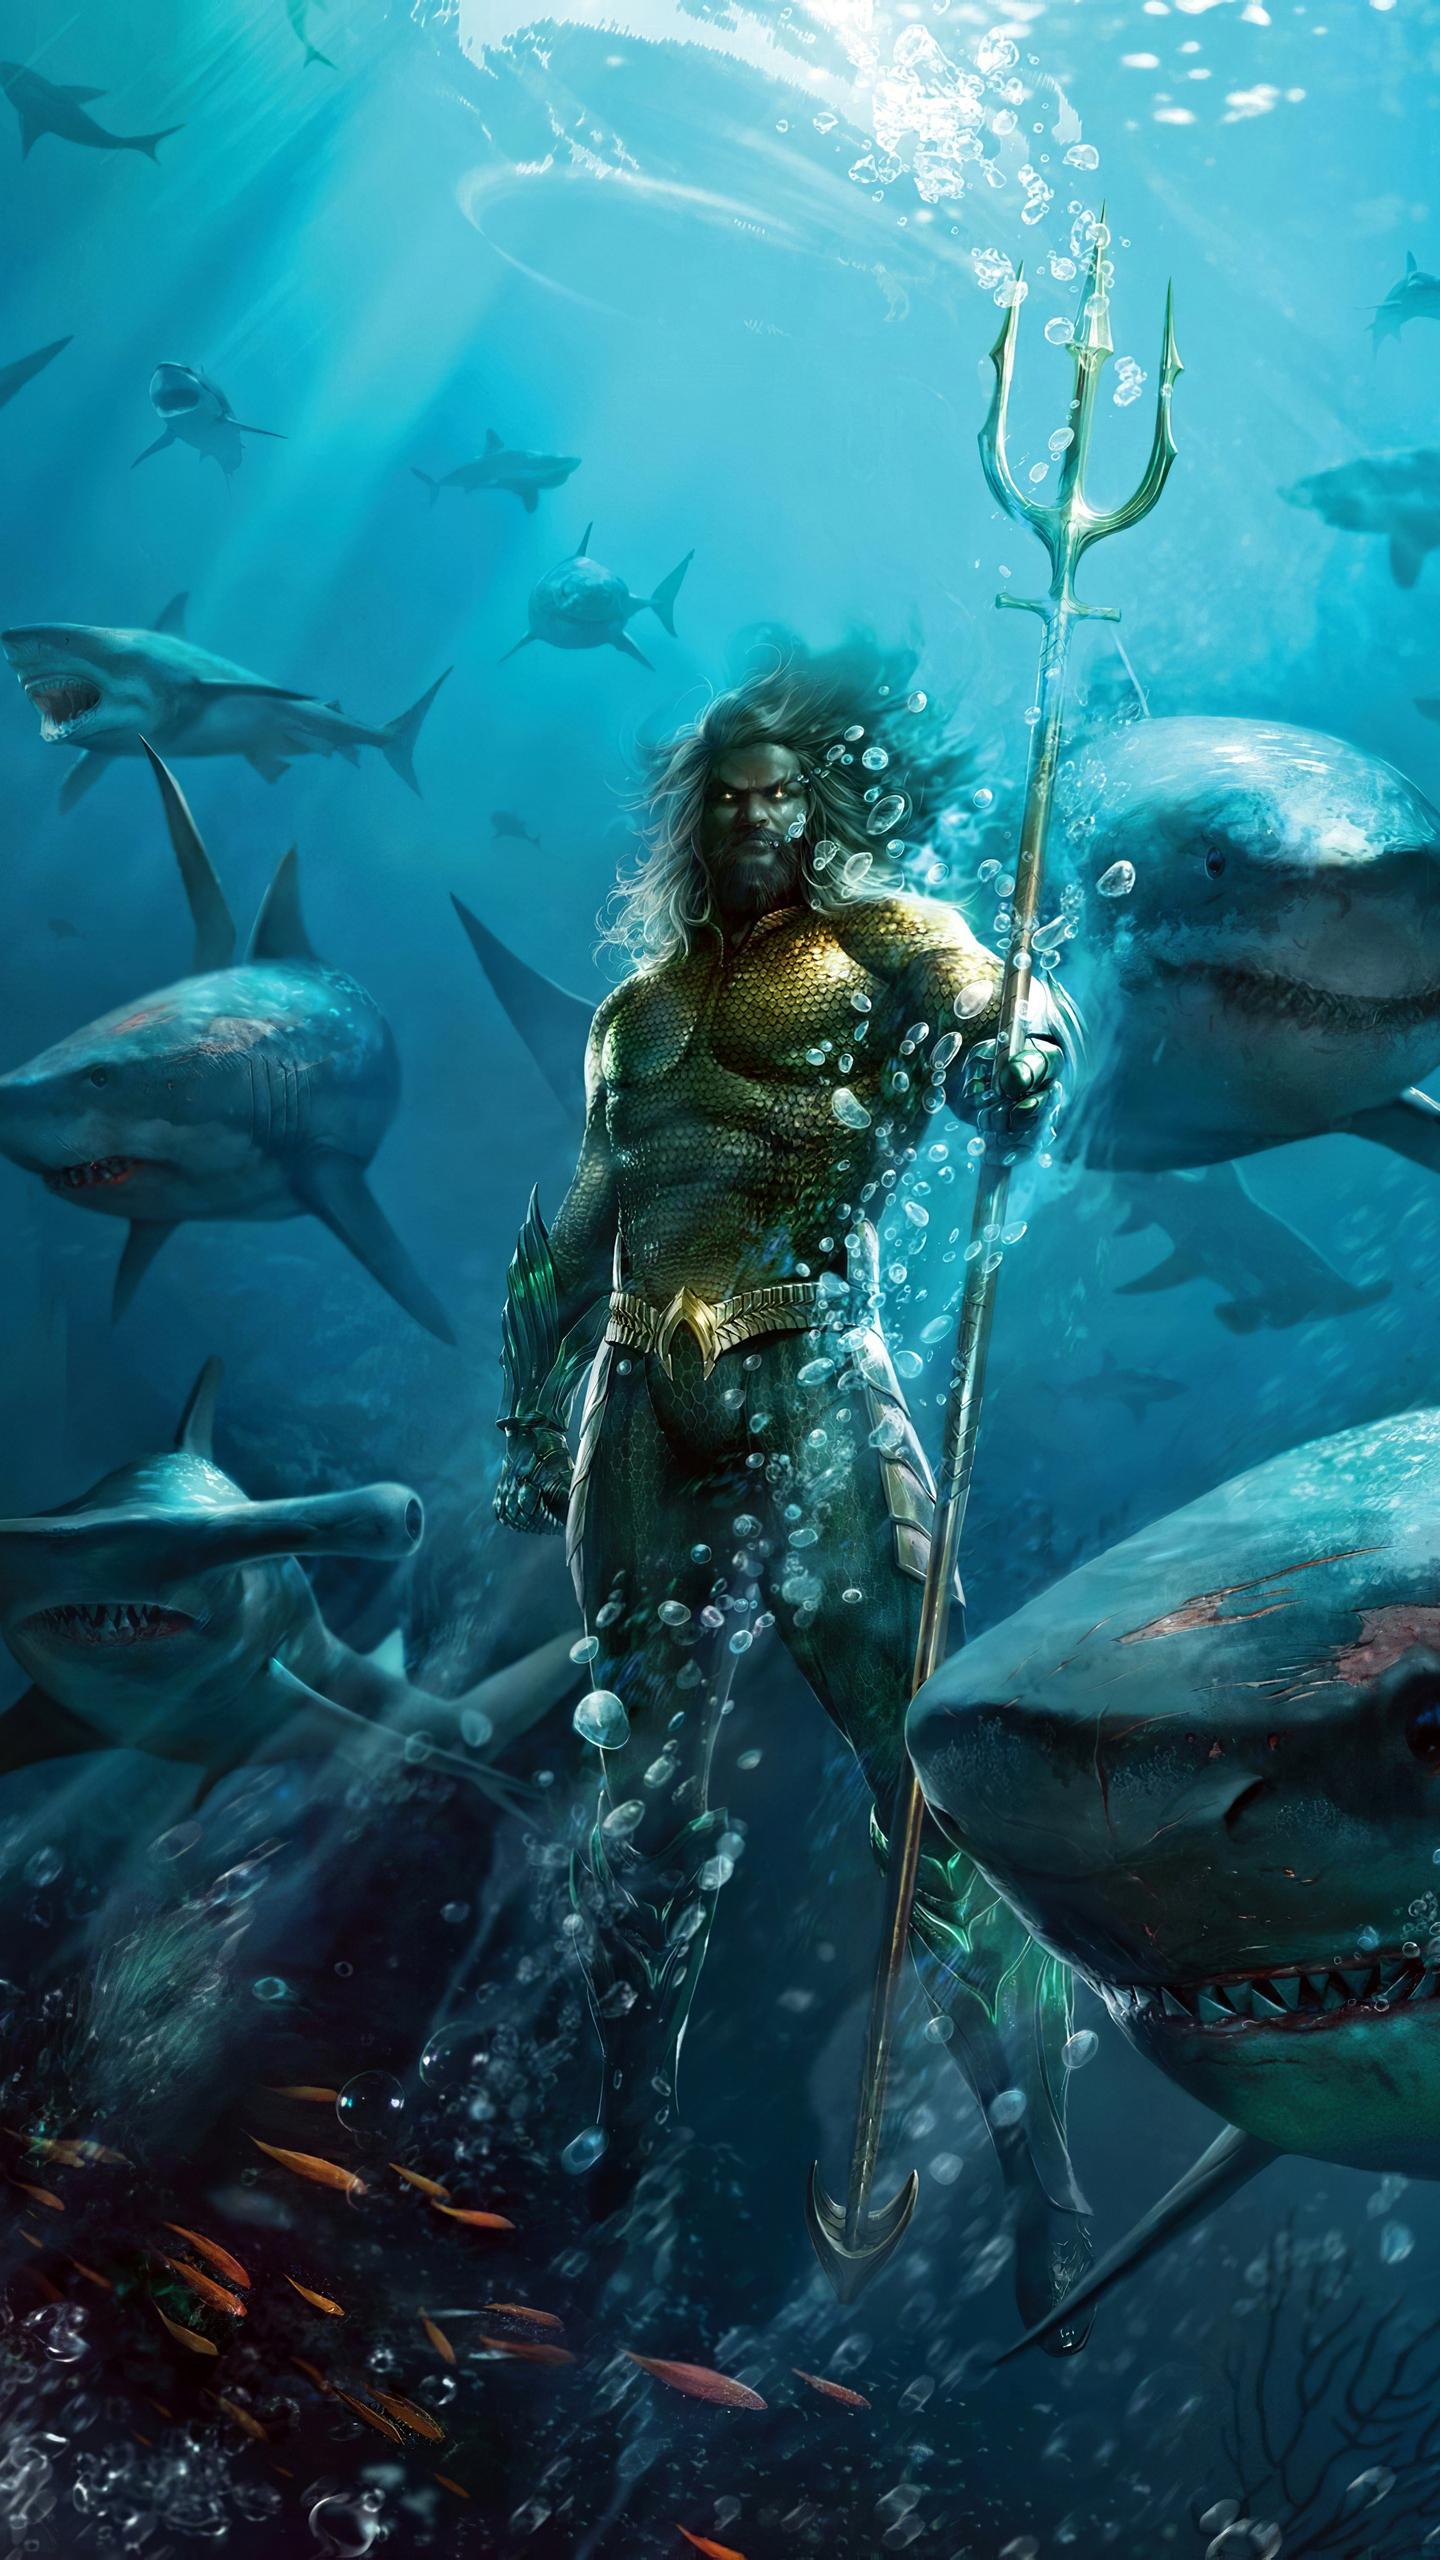 aquaman-under-water-mn.jpg